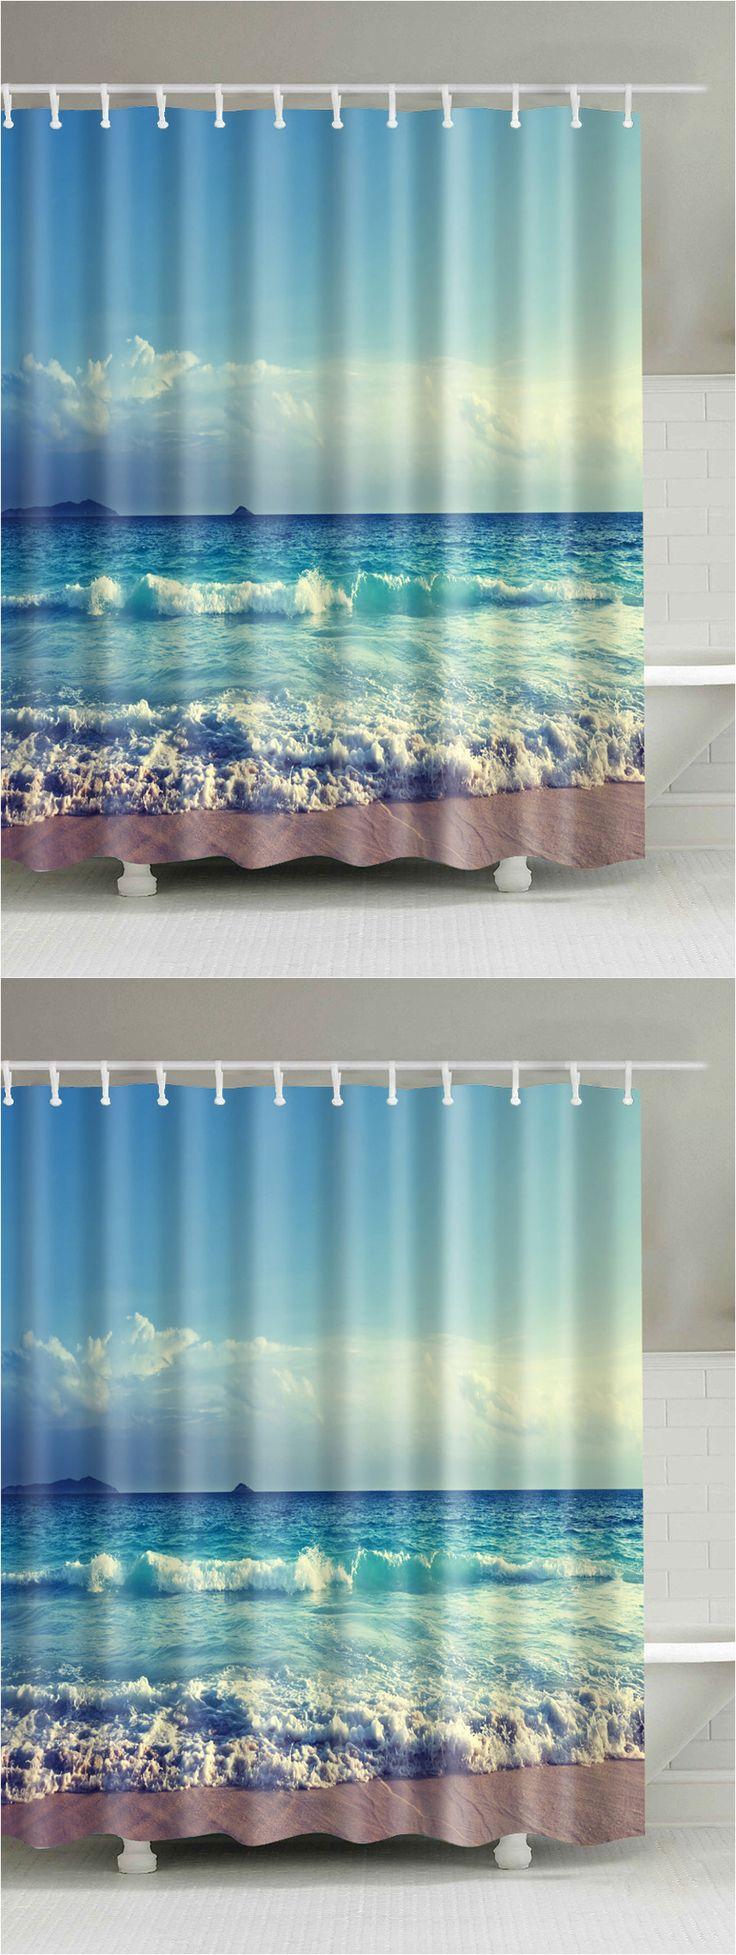 Beachy shower curtains -  17 25 Ocean Print Waterproof Mouldproof Shower Curtain